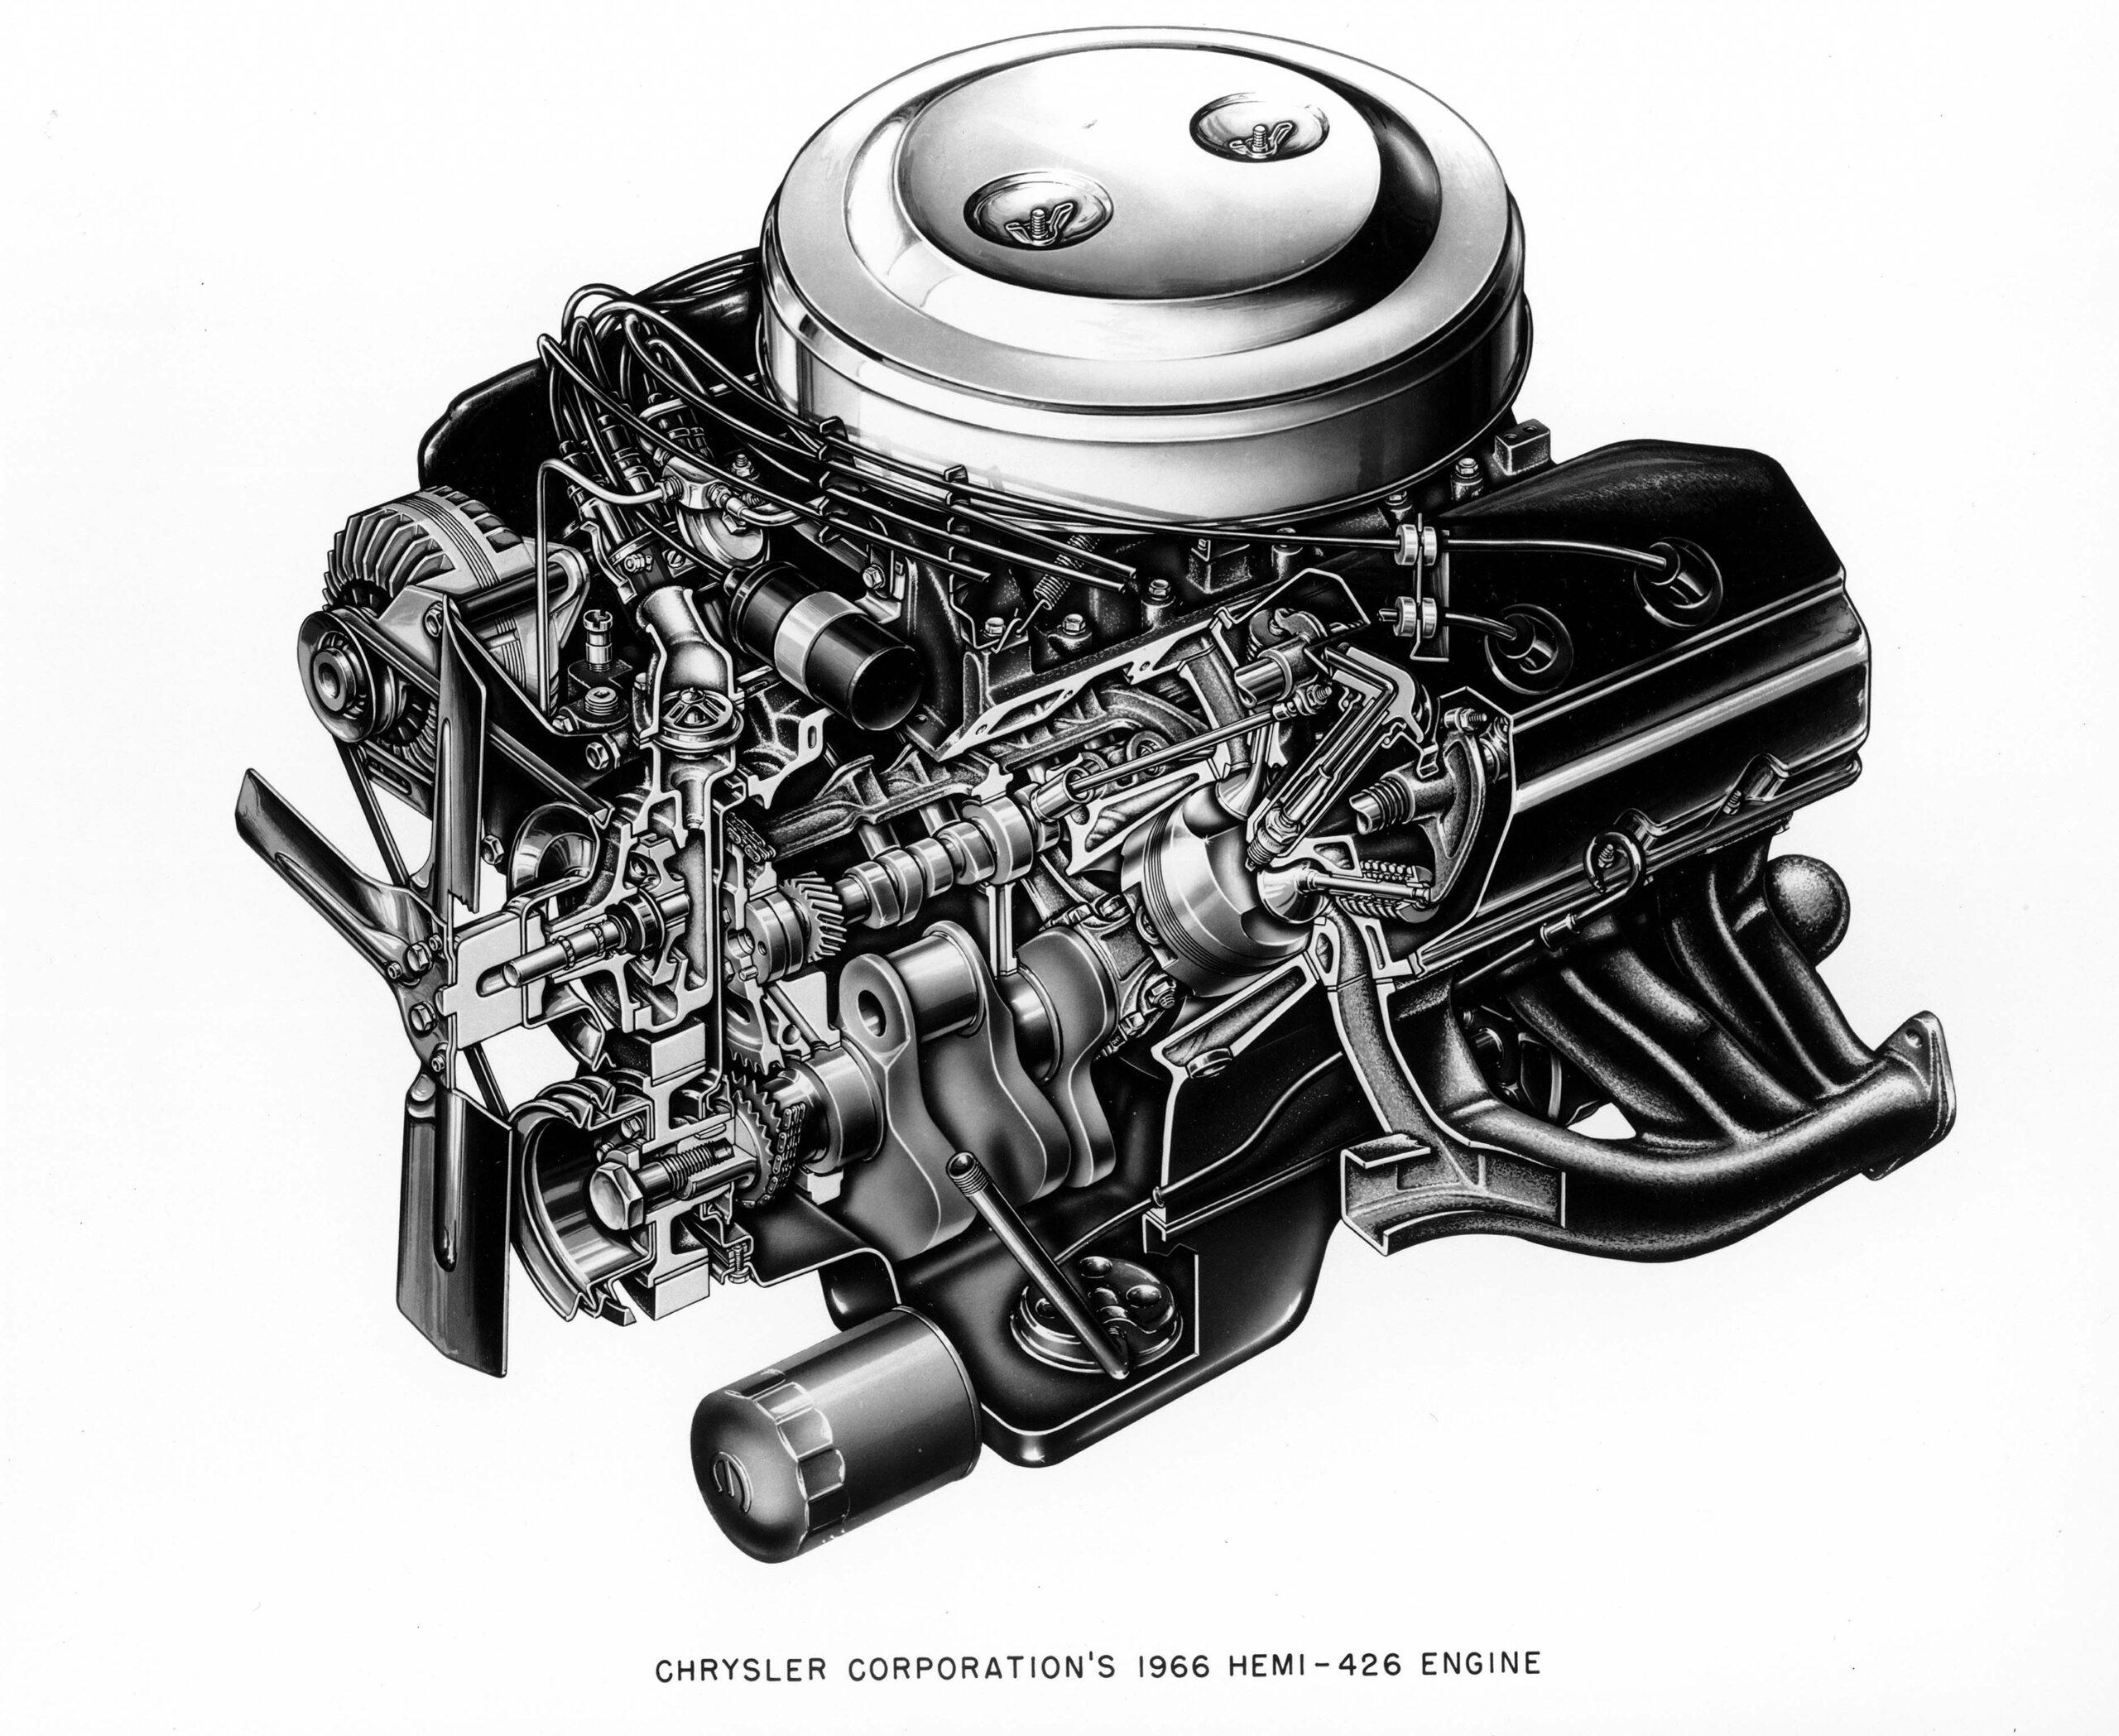 A cutaway illustration of the Hemi V8